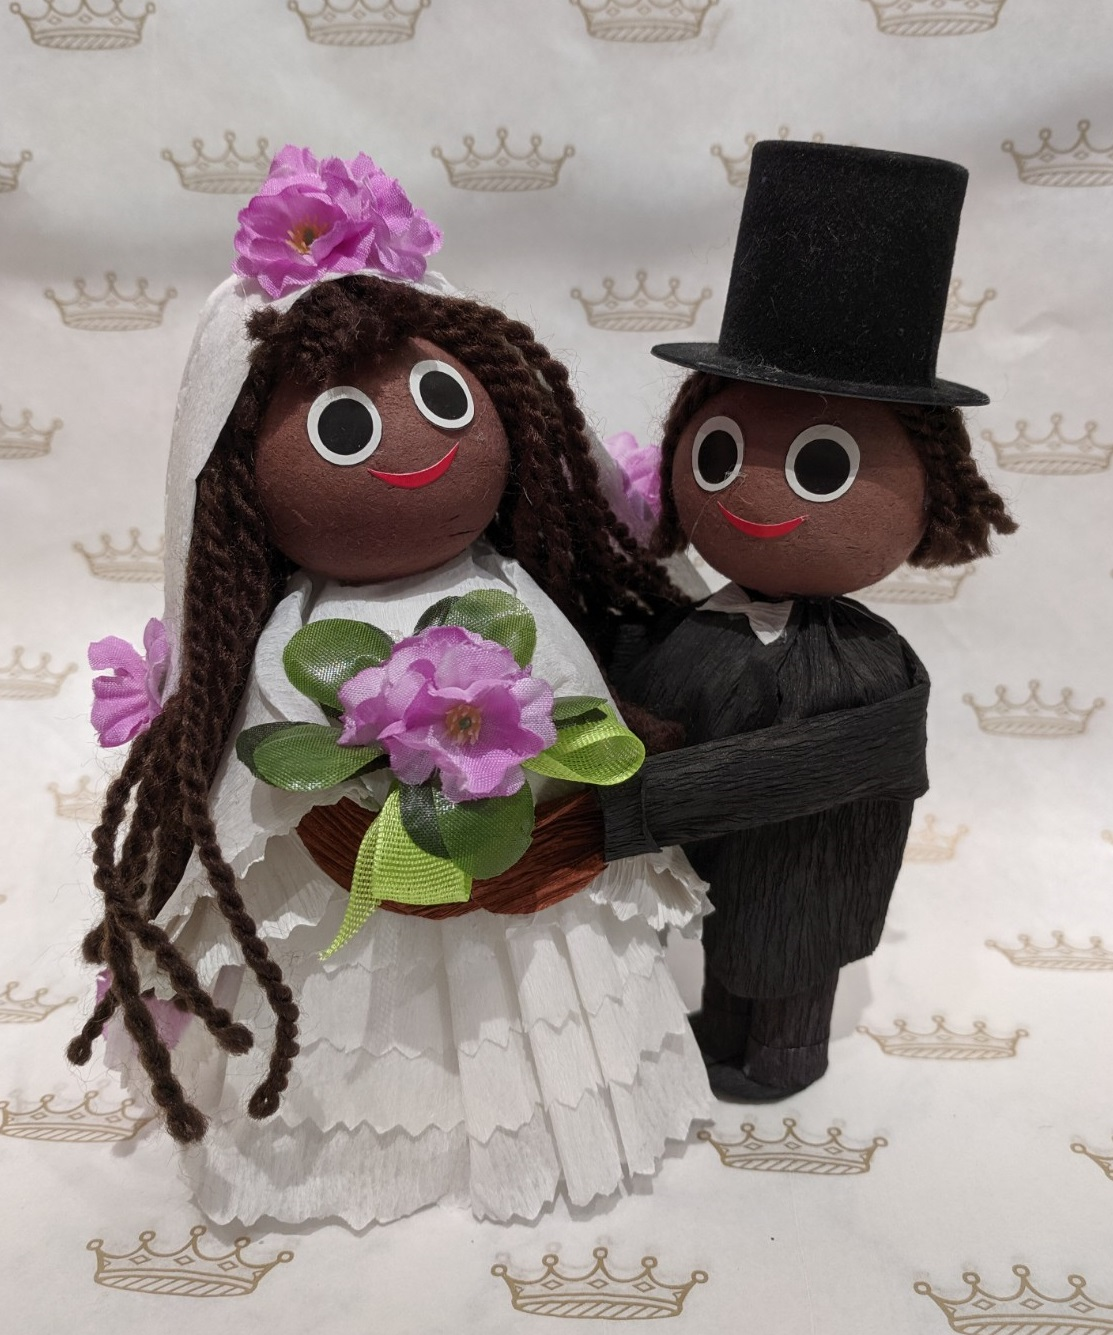 2-711abcdl-bride-groom-2pc.jpg